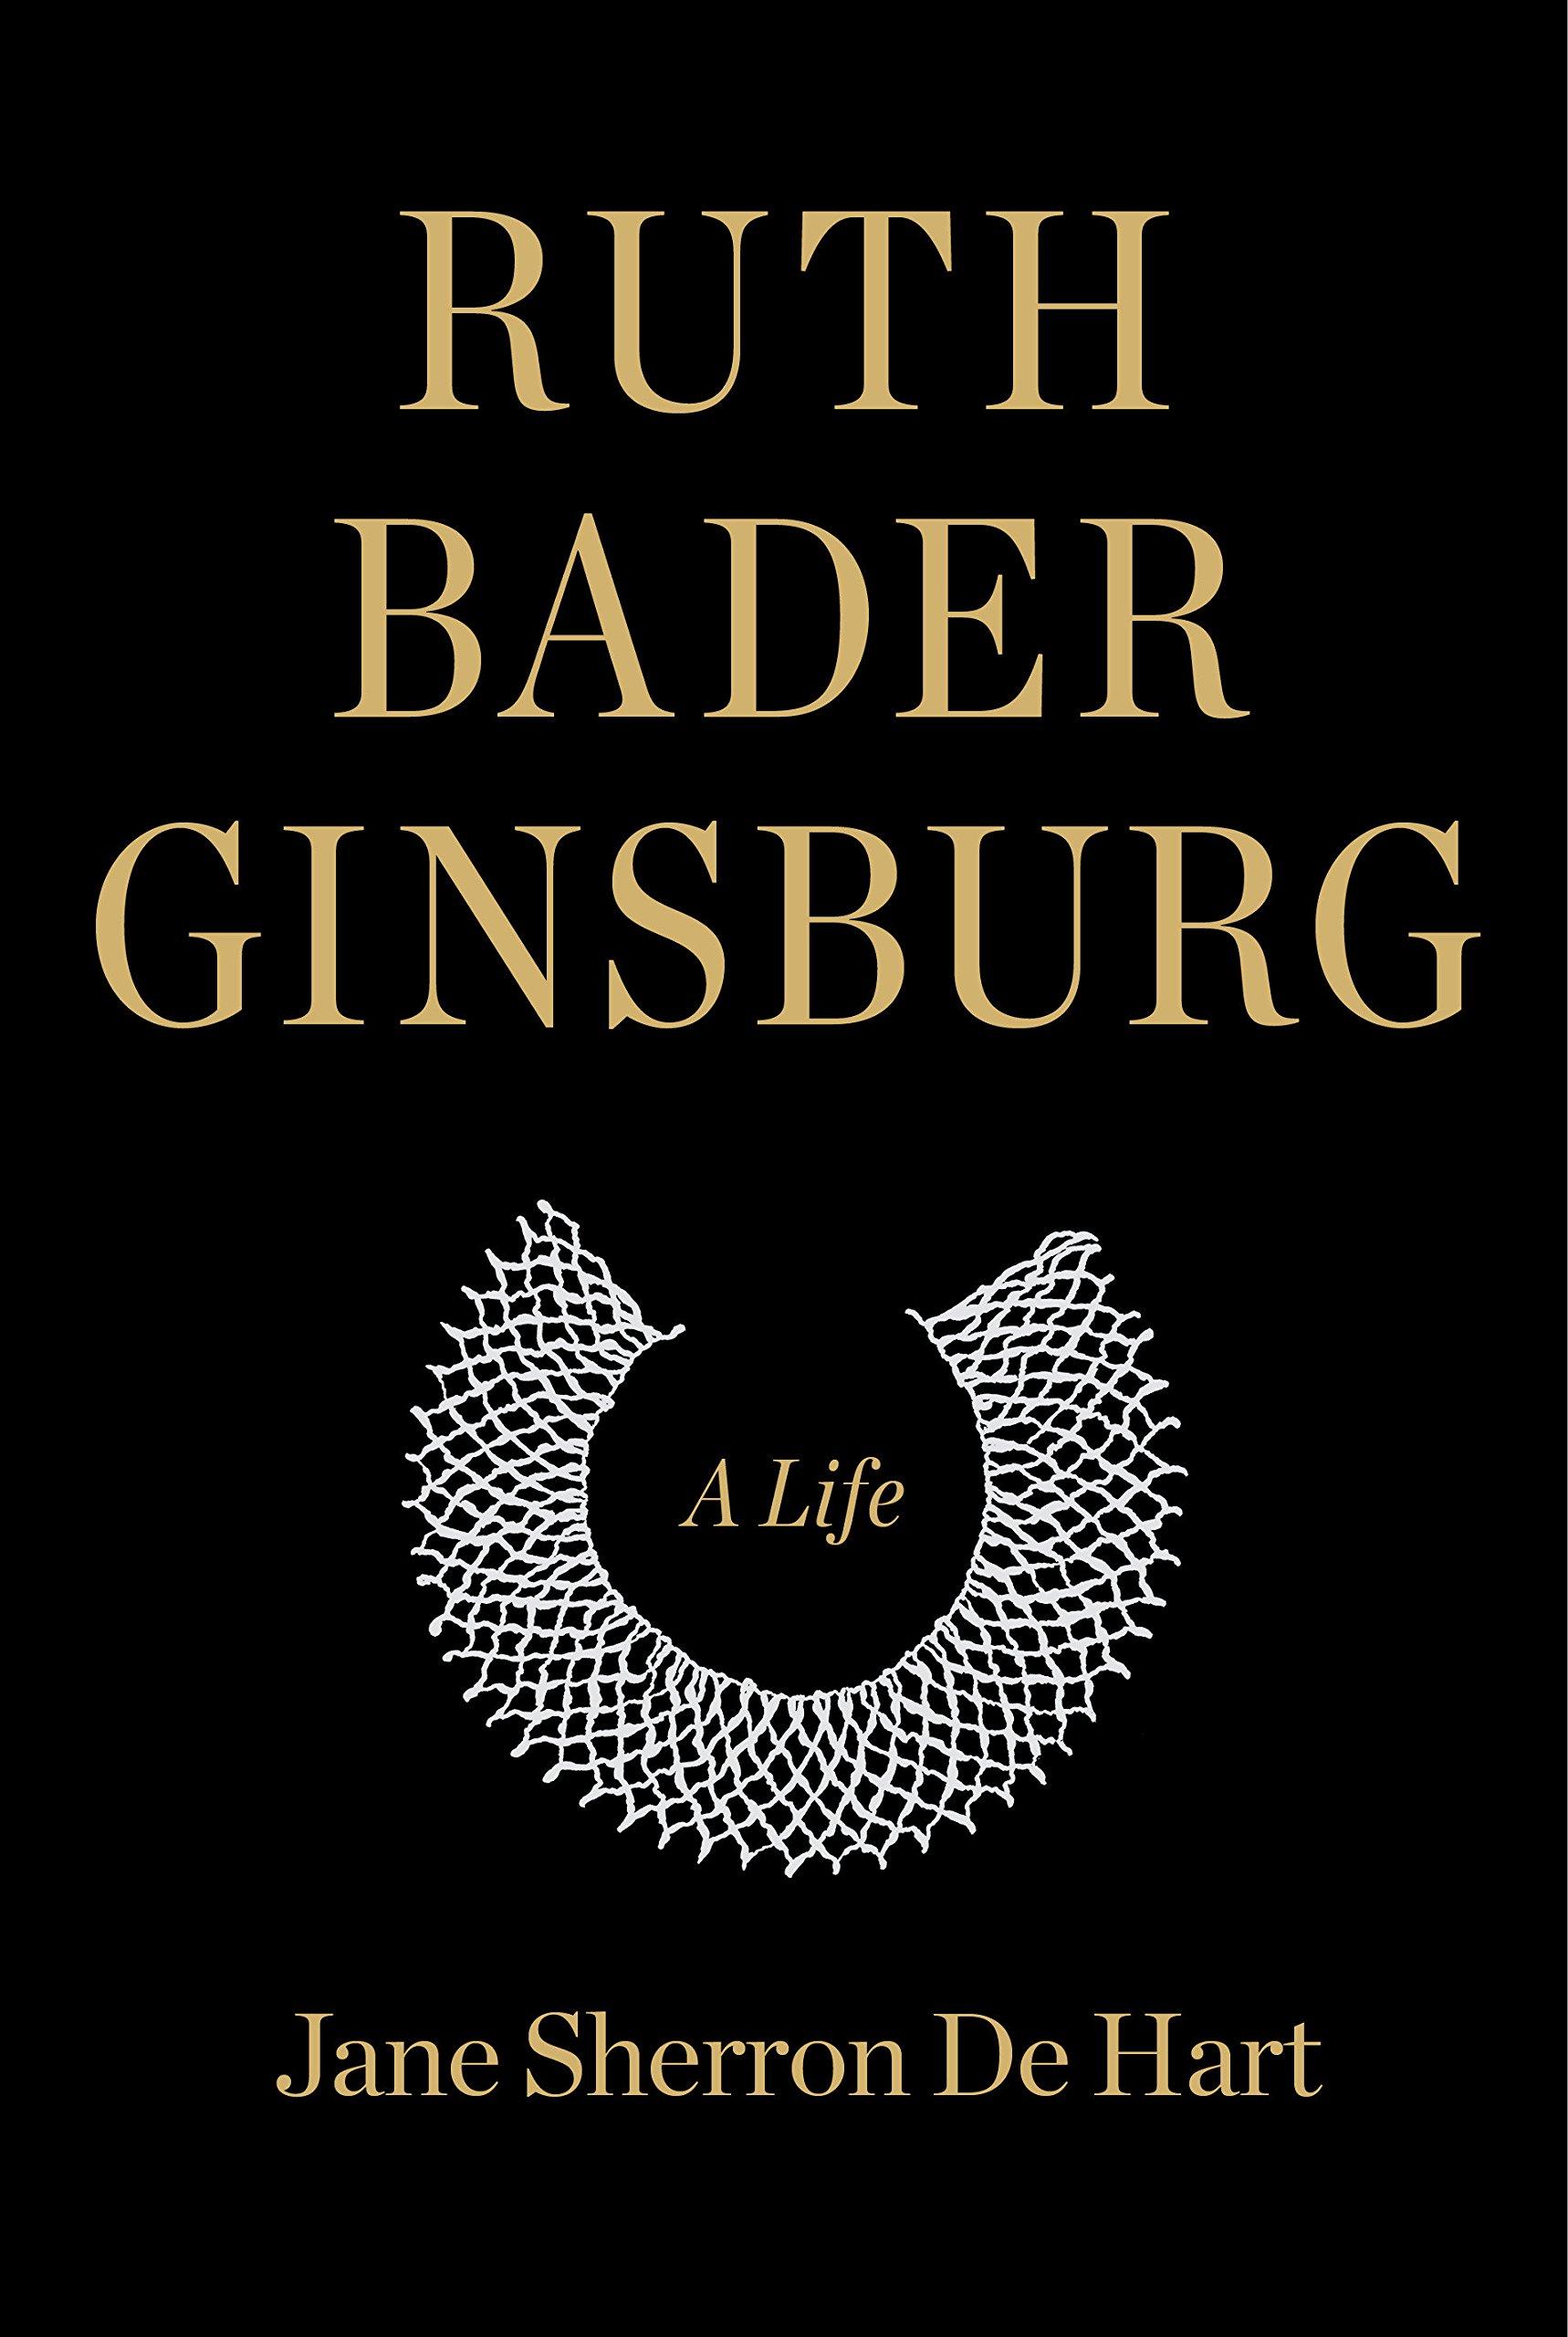 Ruth Bader Ginsberg: A Life | TBR etc.